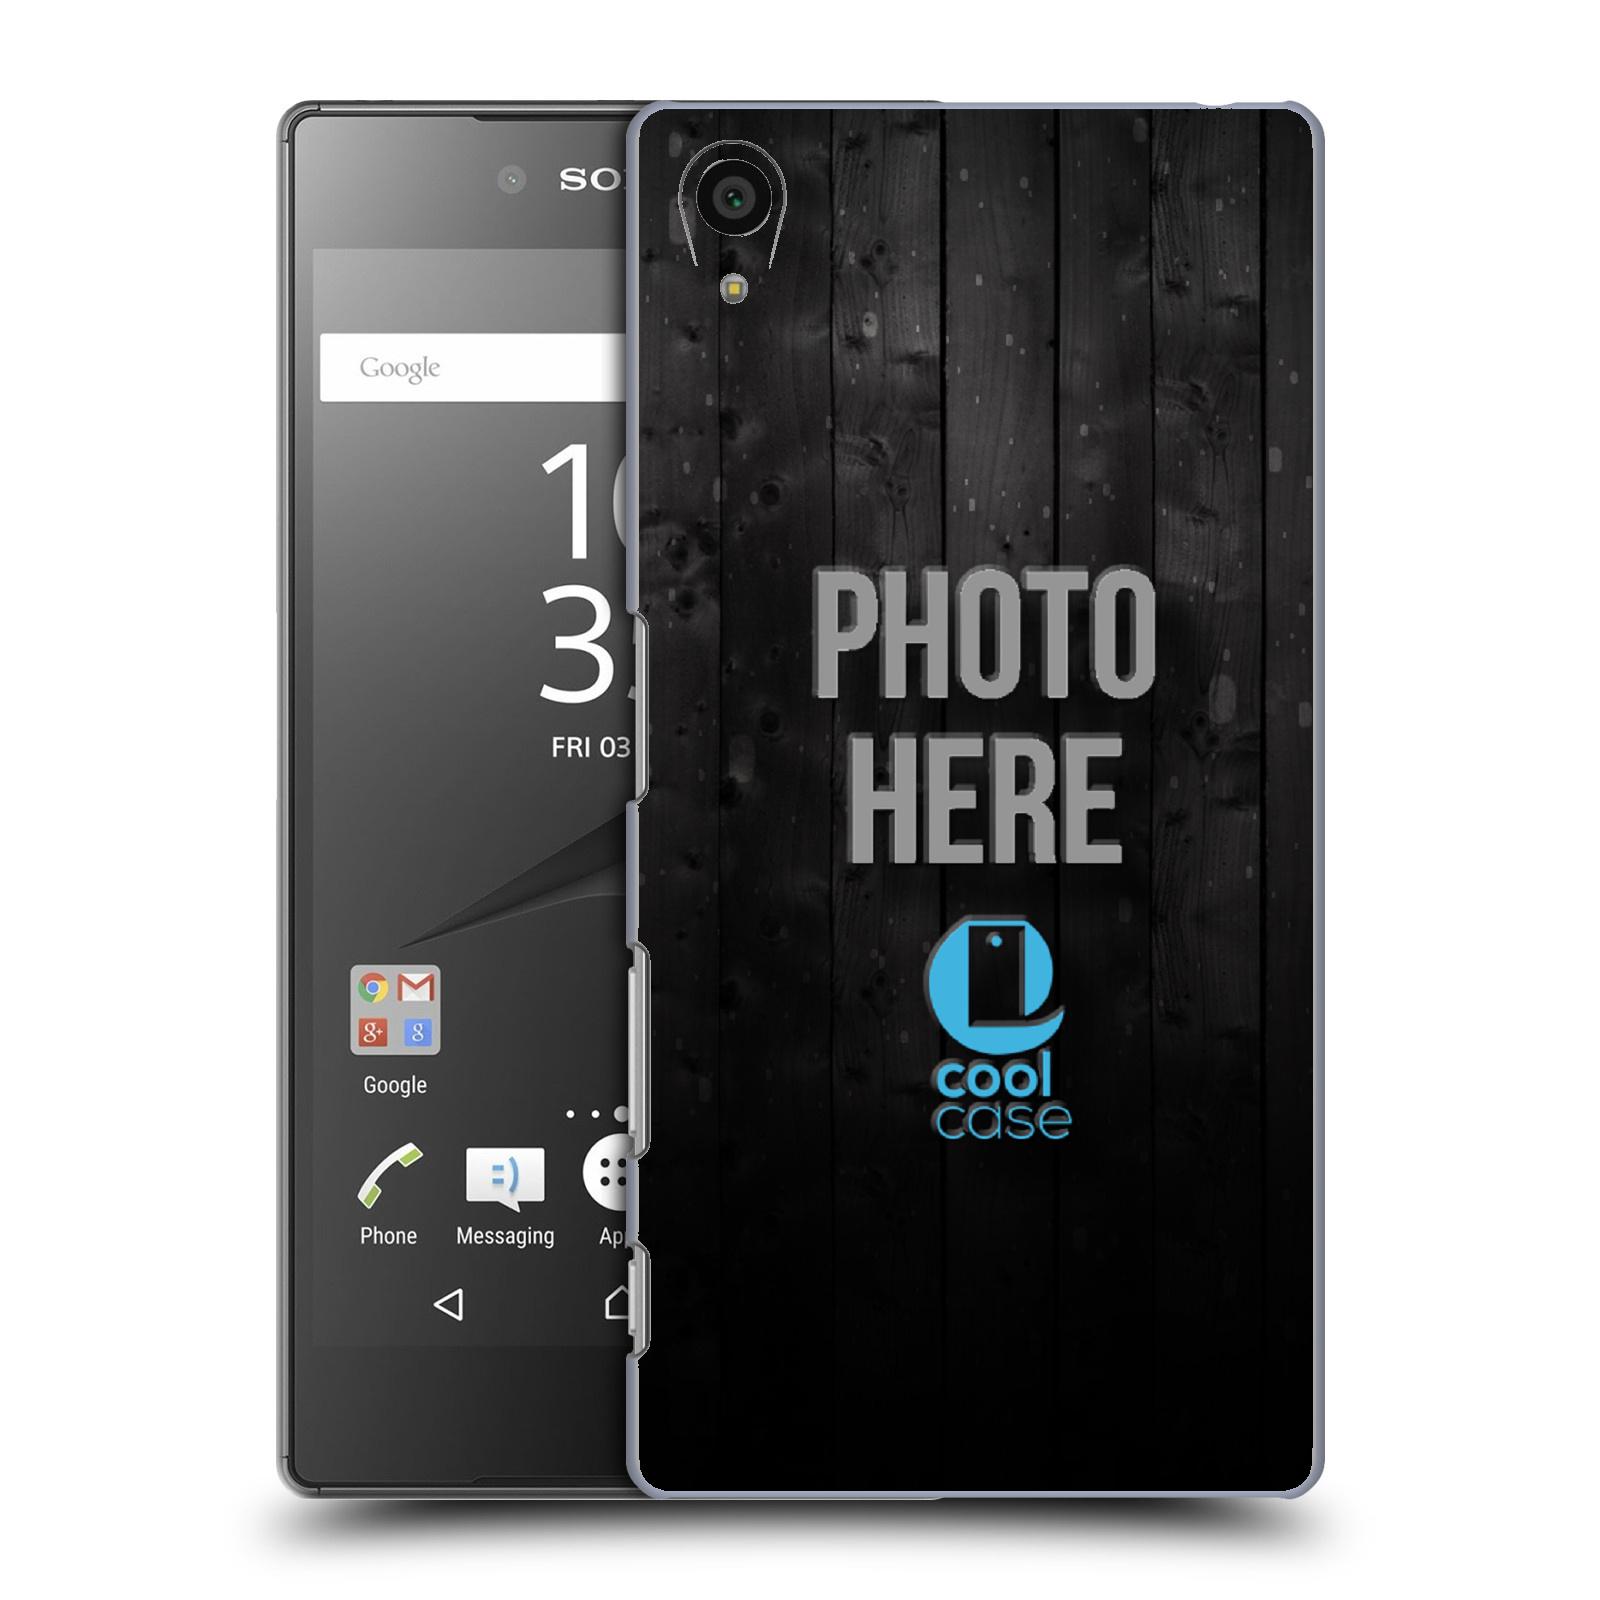 Silikonové pouzdro na mobil Sony Xperia Z5 HEAD CASE s vlastním motivem (Silikonový kryt či obal s vlastní fotografií na mobilní telefon Sony Xperia Z5 E6653)